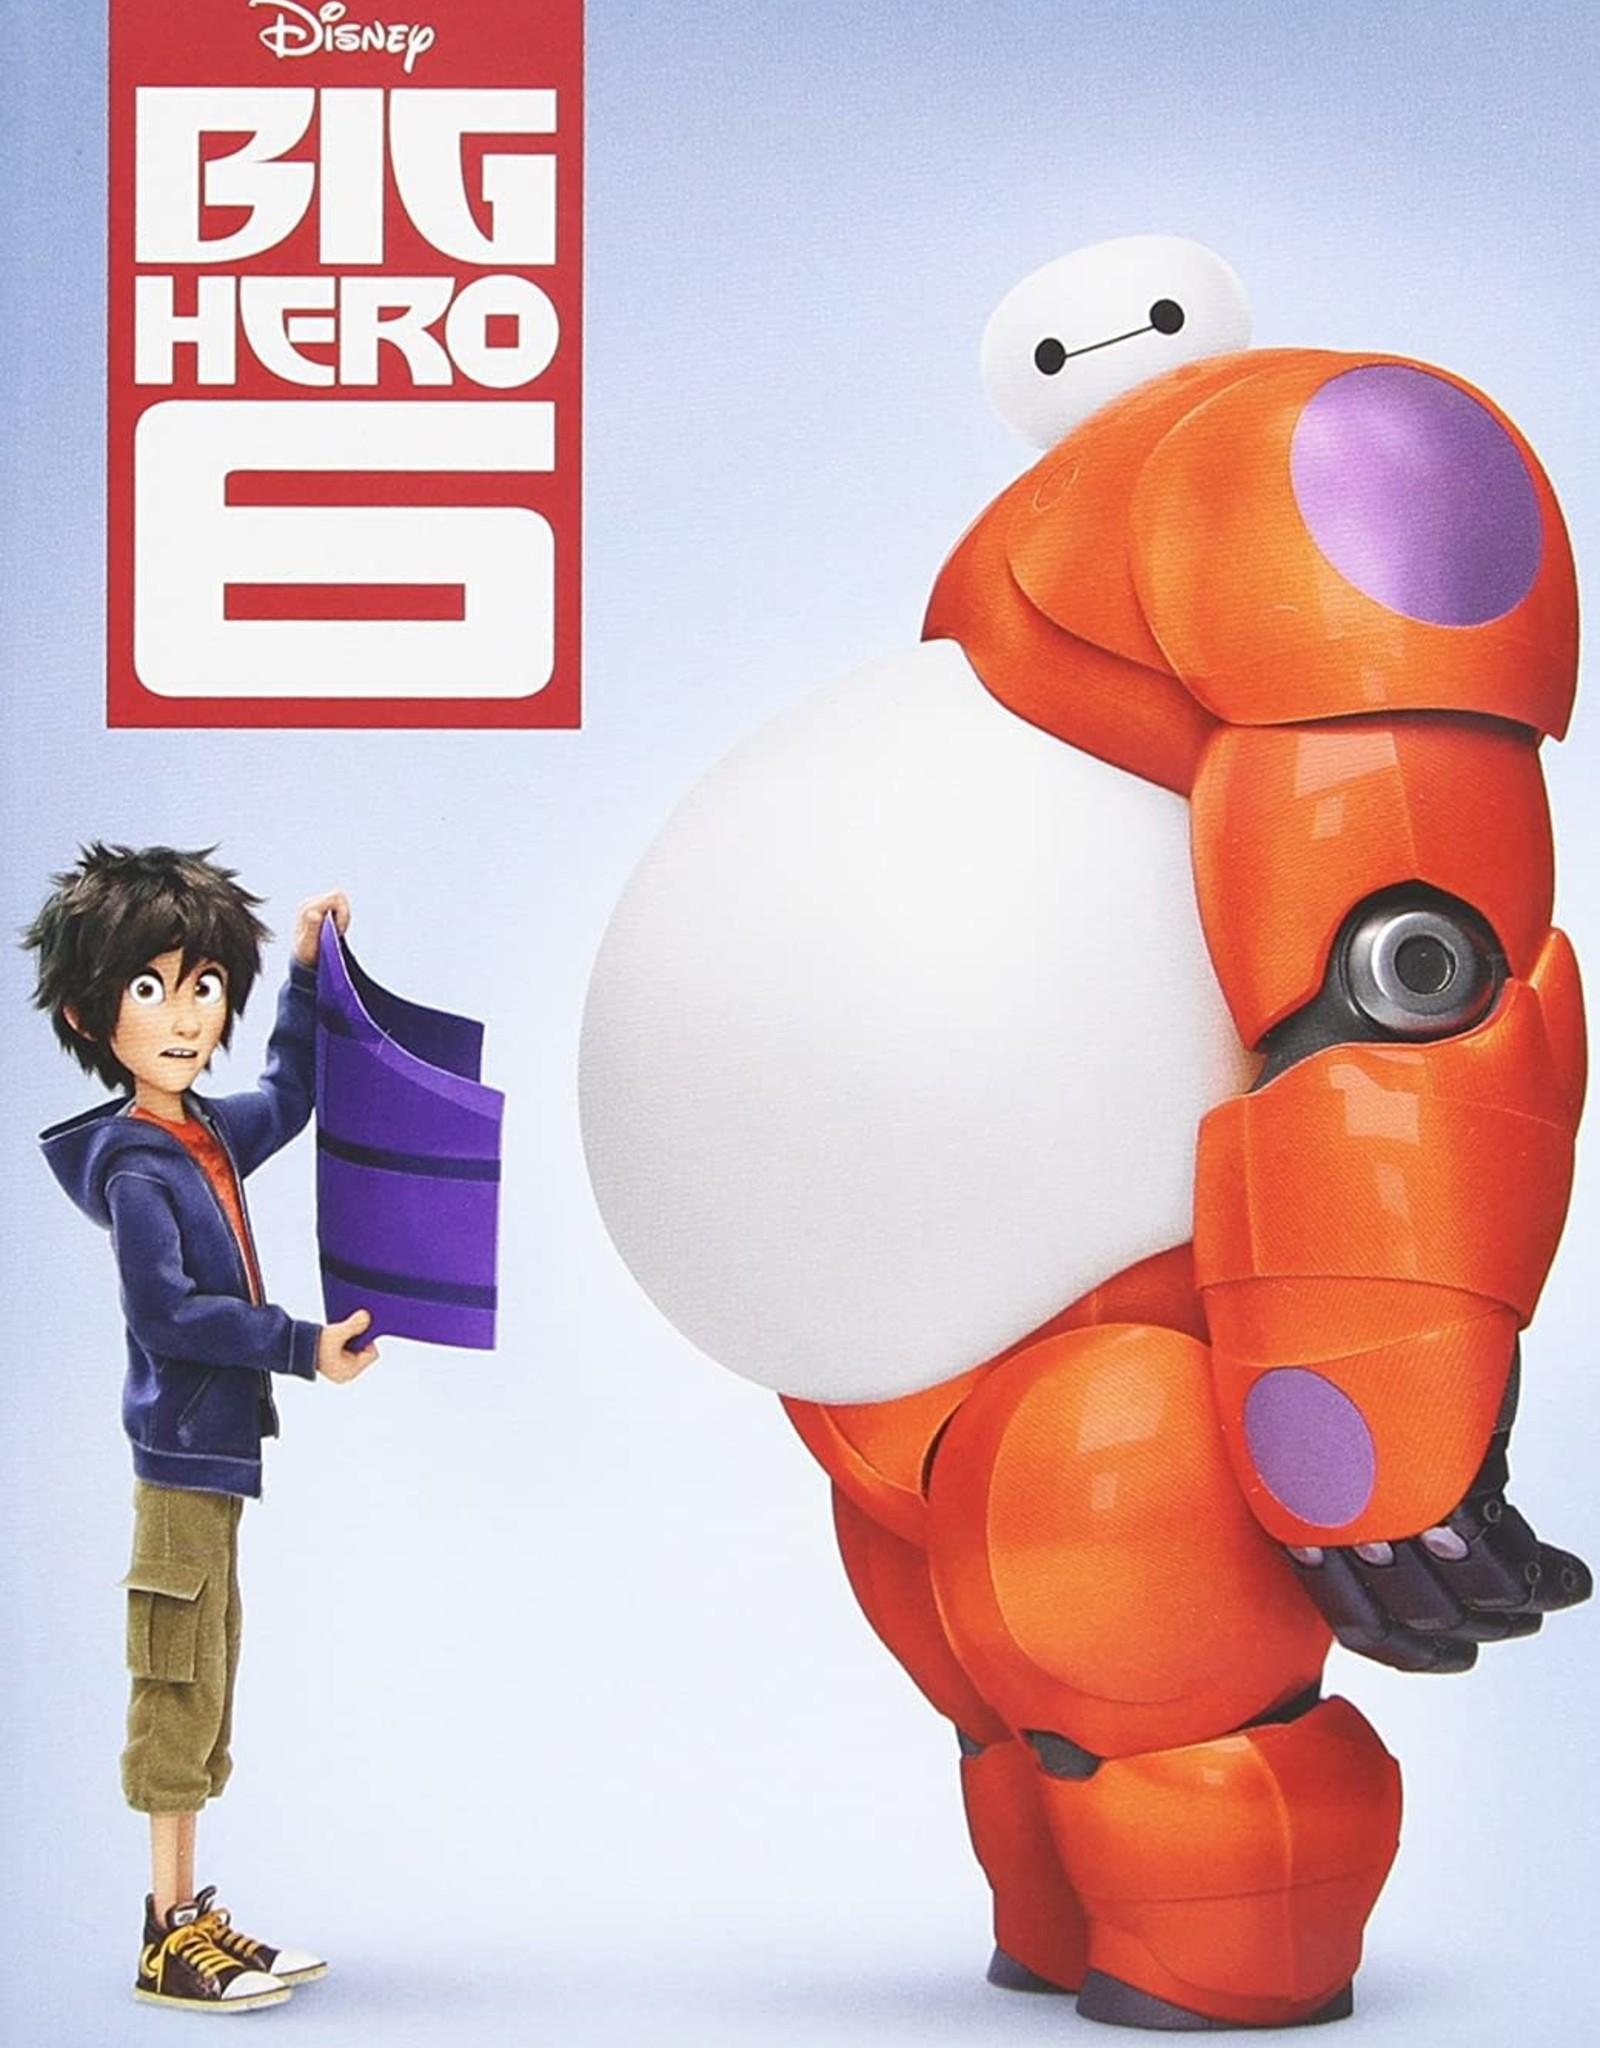 Disney Big Hero 6 (USED)